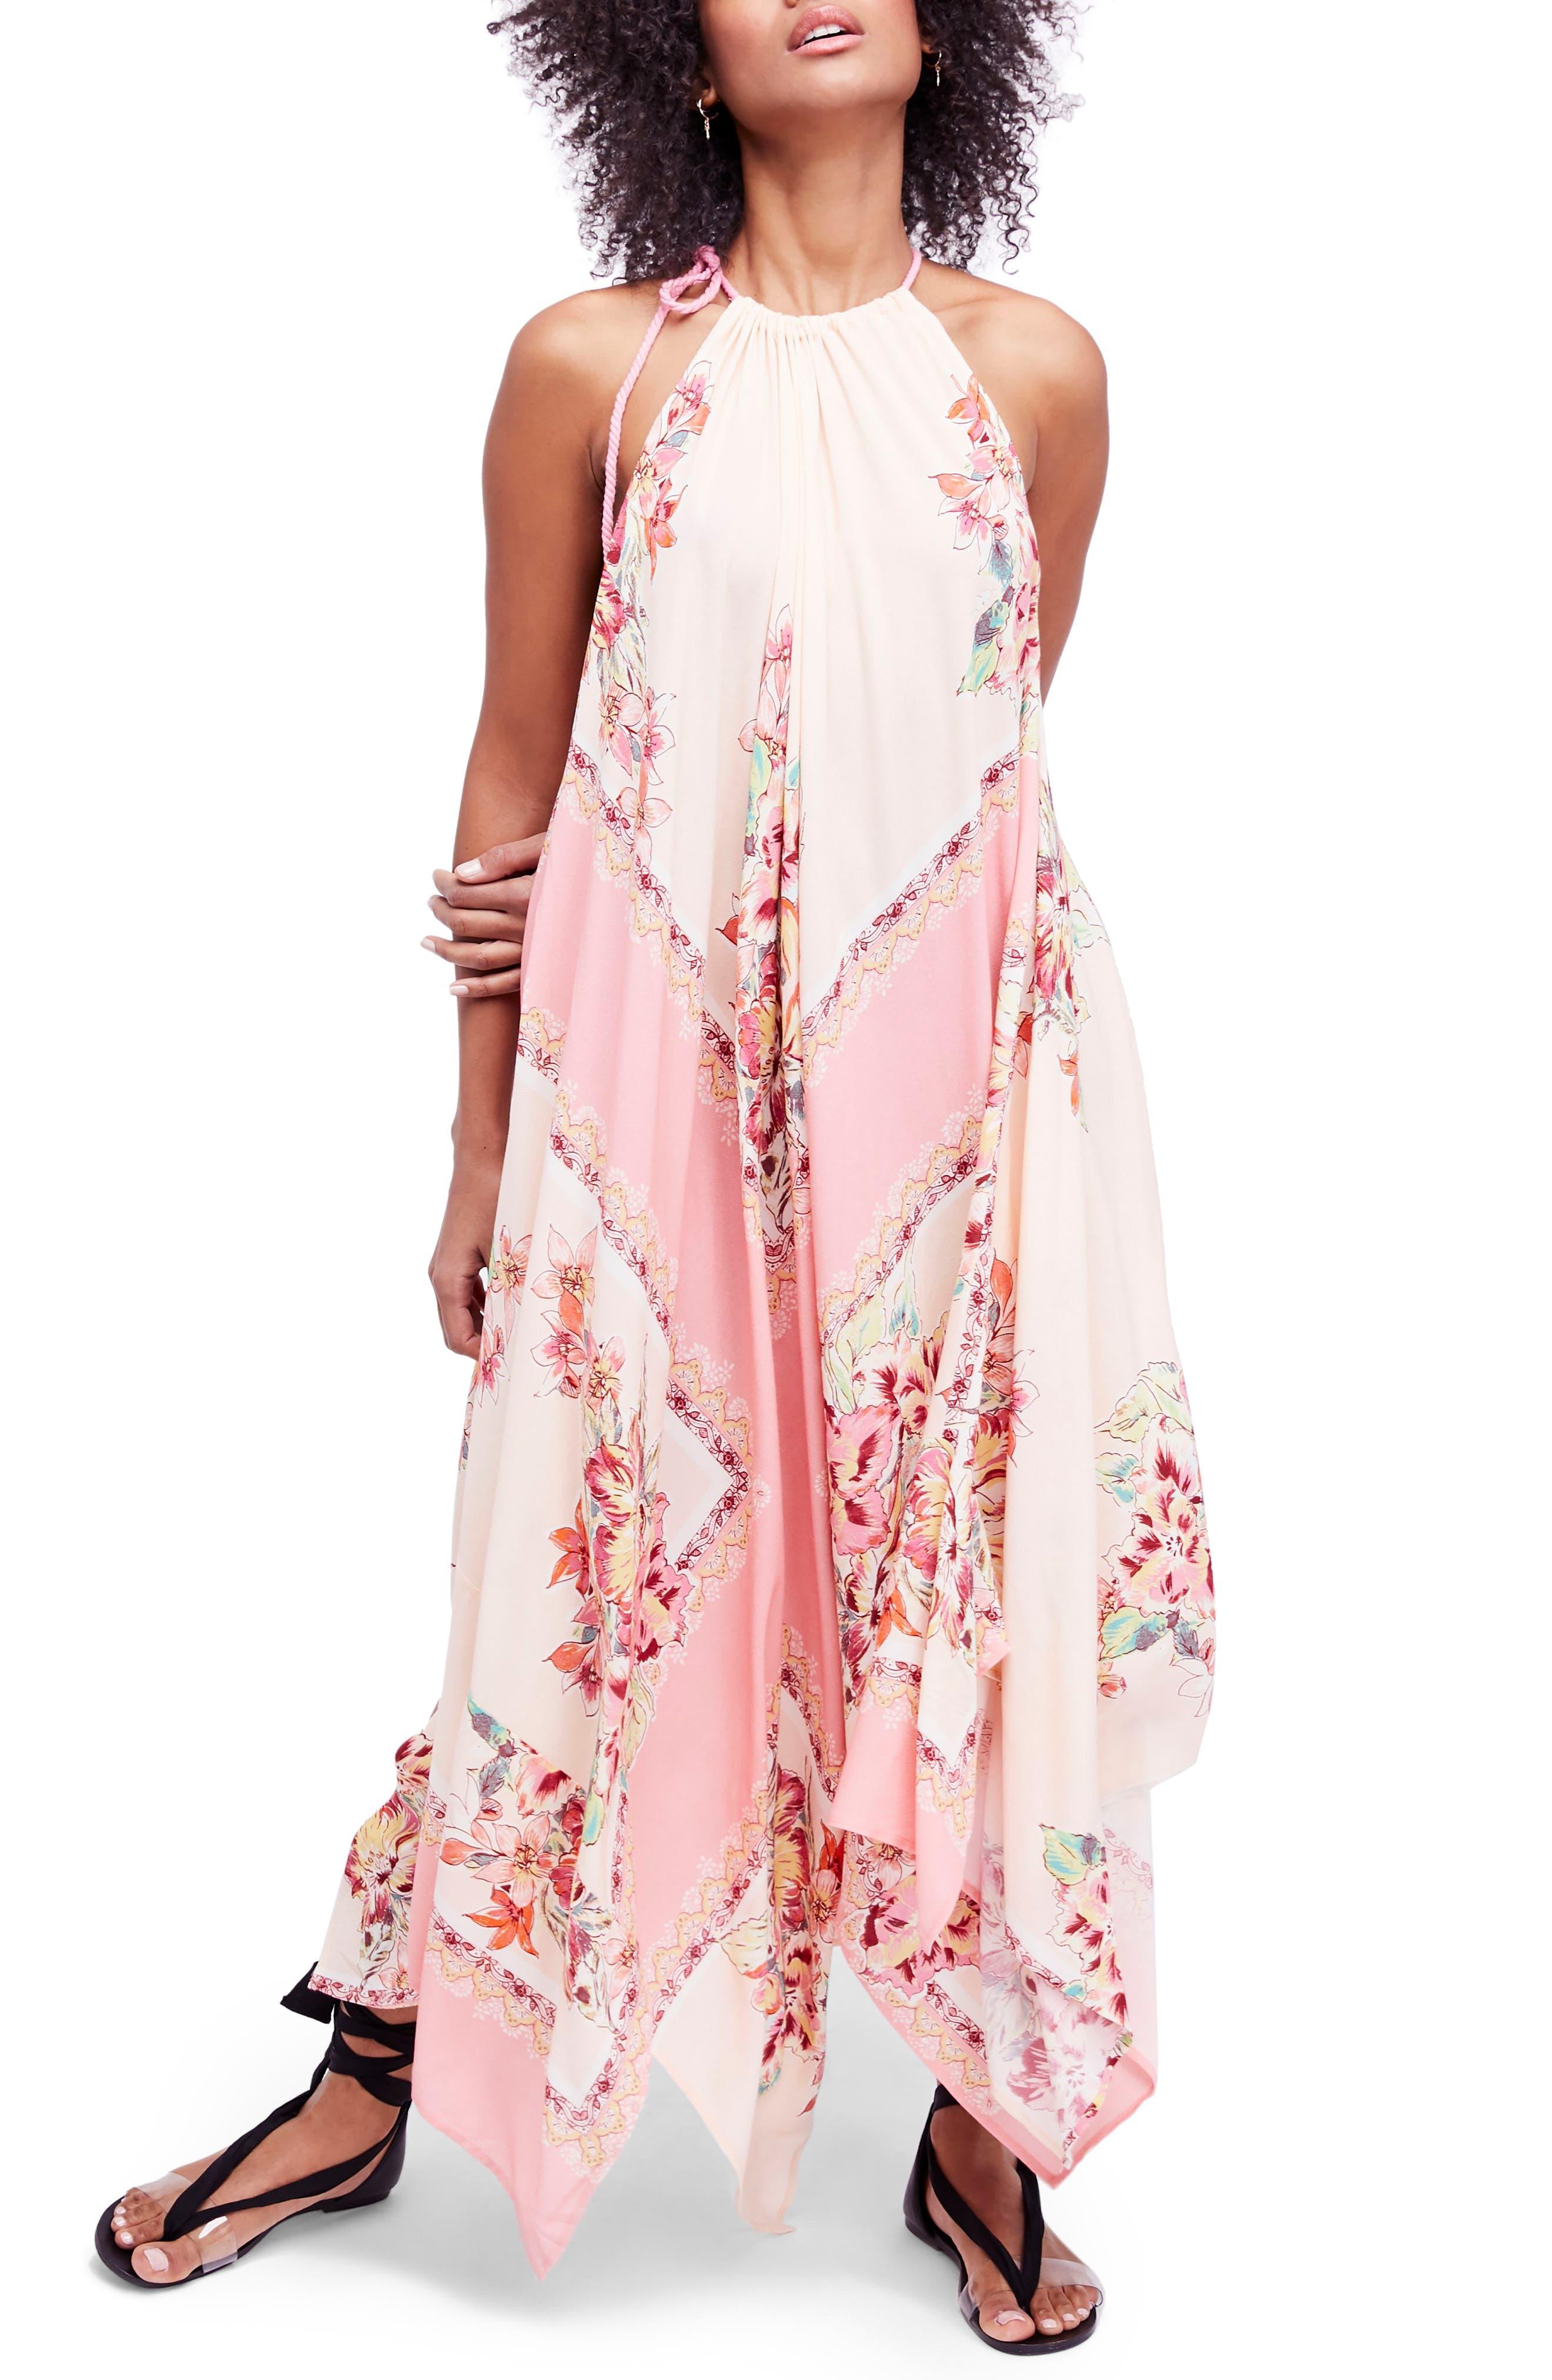 Mind's Eye Maxi Dress,                         Main,                         color, Pink